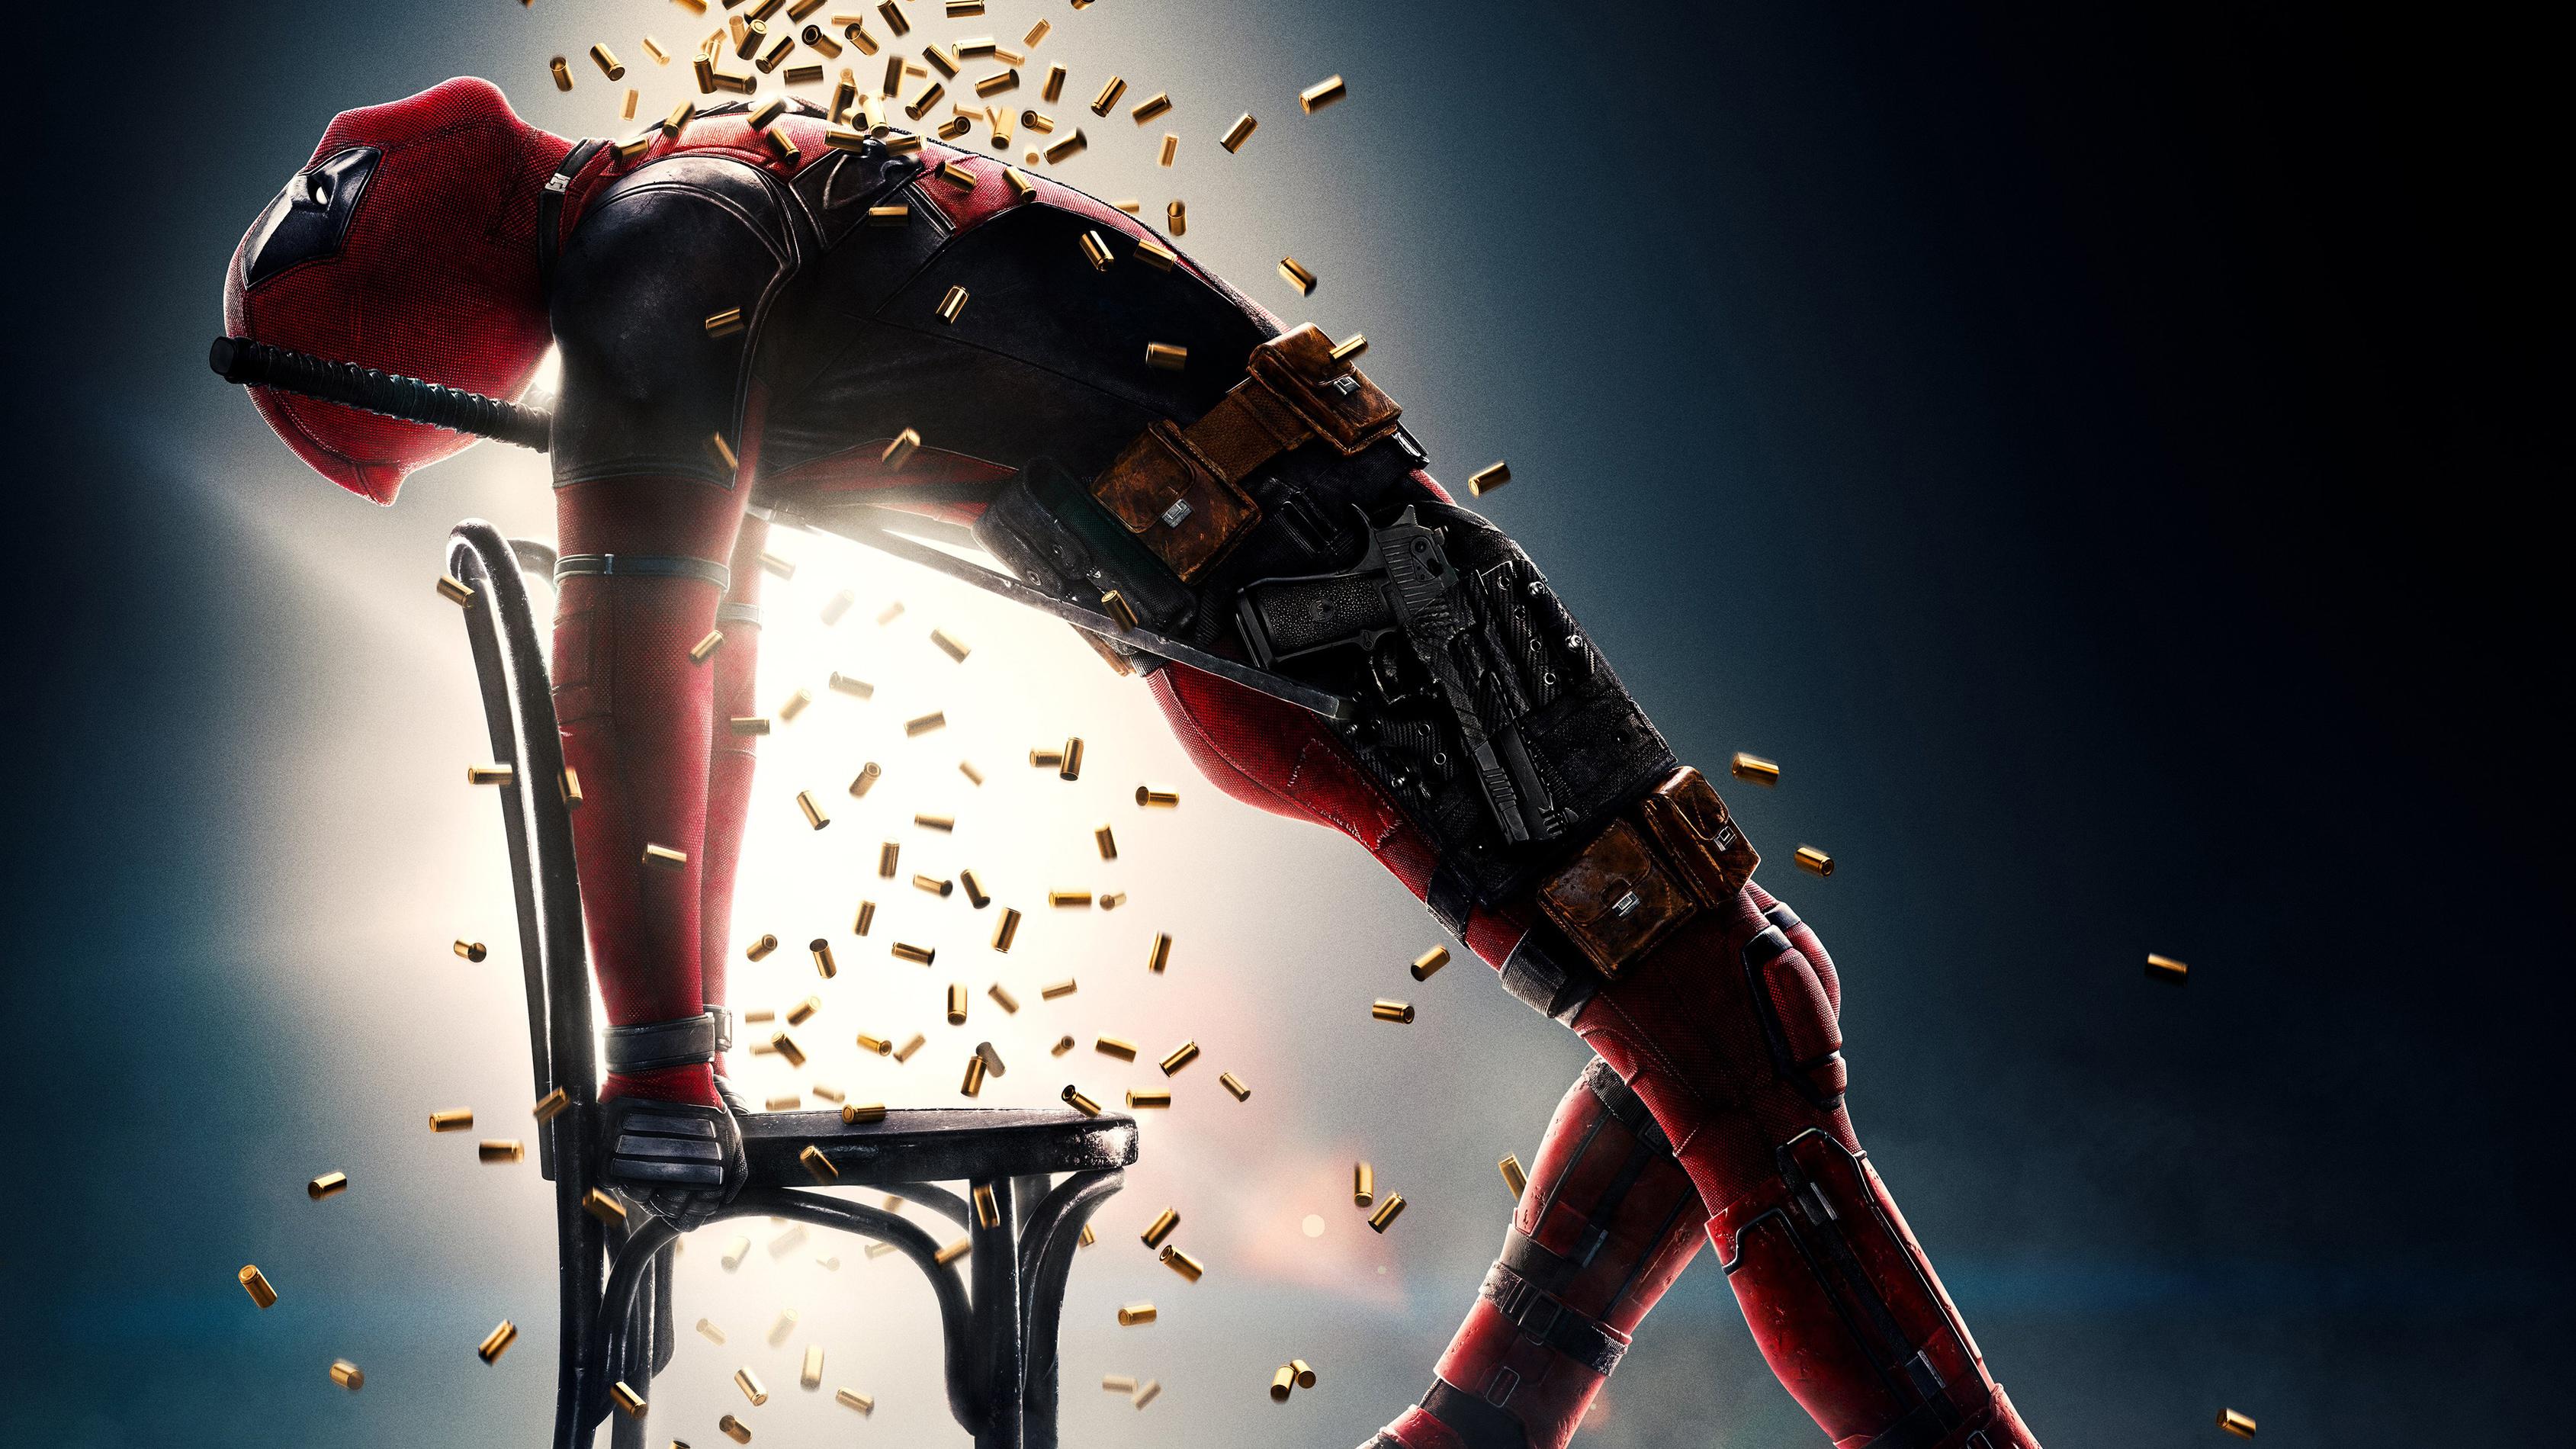 Deadpool 2 Movie Poster 4k, HD Movies, 4k Wallpapers